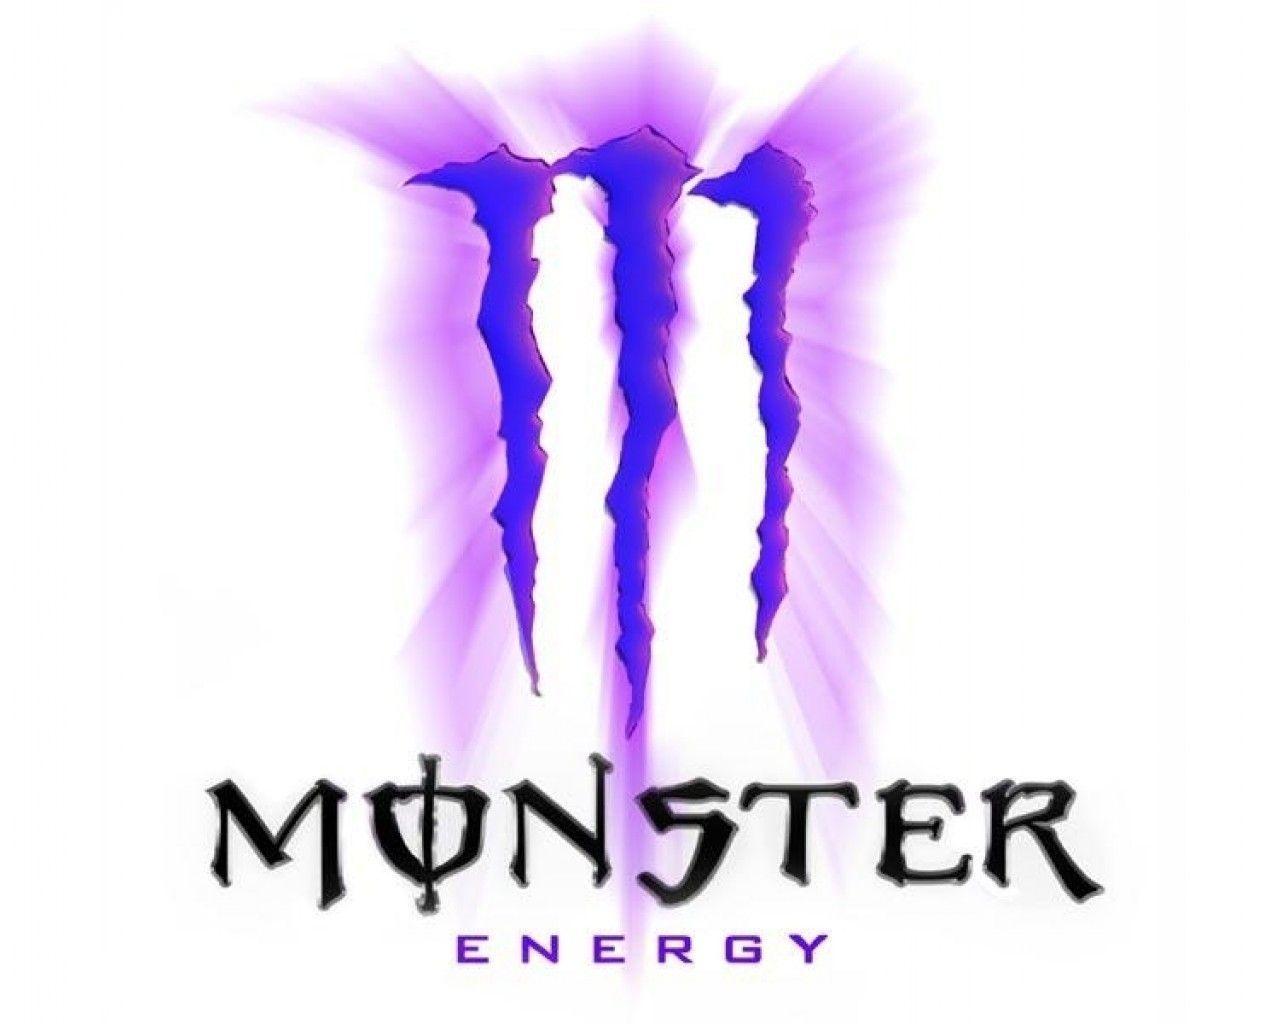 Cool Monster Energy Wallpapers - Wallpaper Cave  Monster